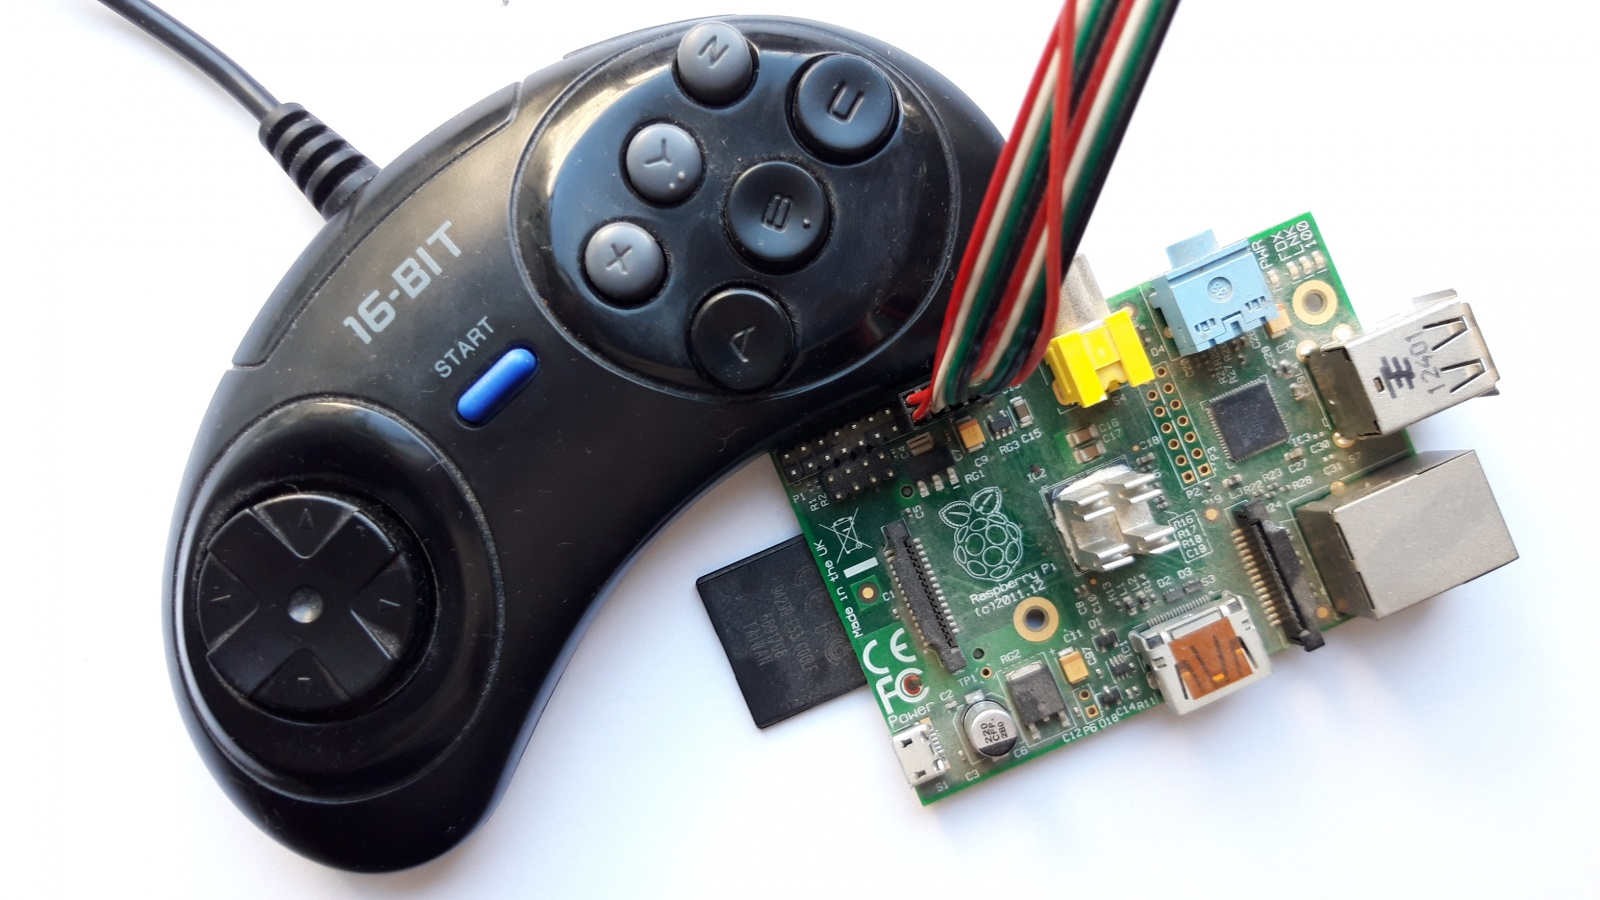 Геймпад от Sega Mega Drive и Raspberry Pi Часть 2 (заключительная шестикнопочная) - 1